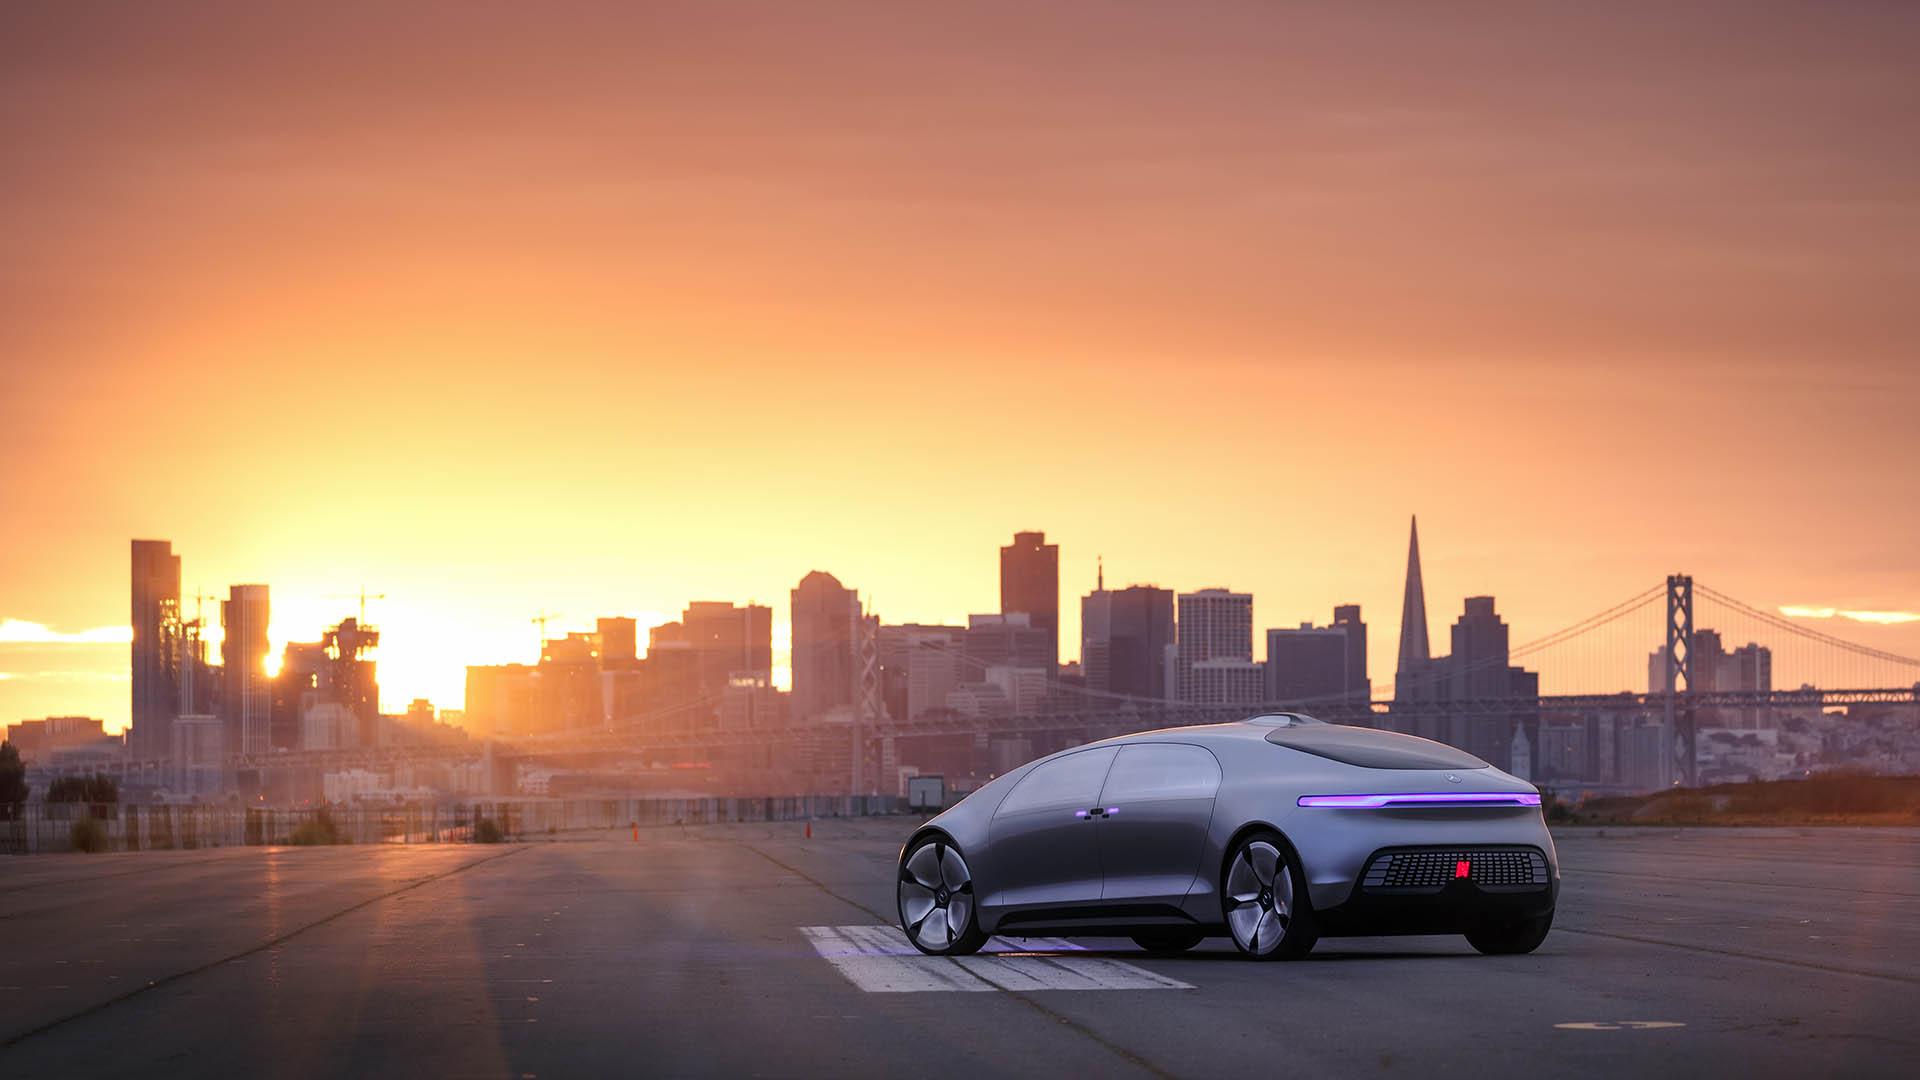 F015 © Daimler AG